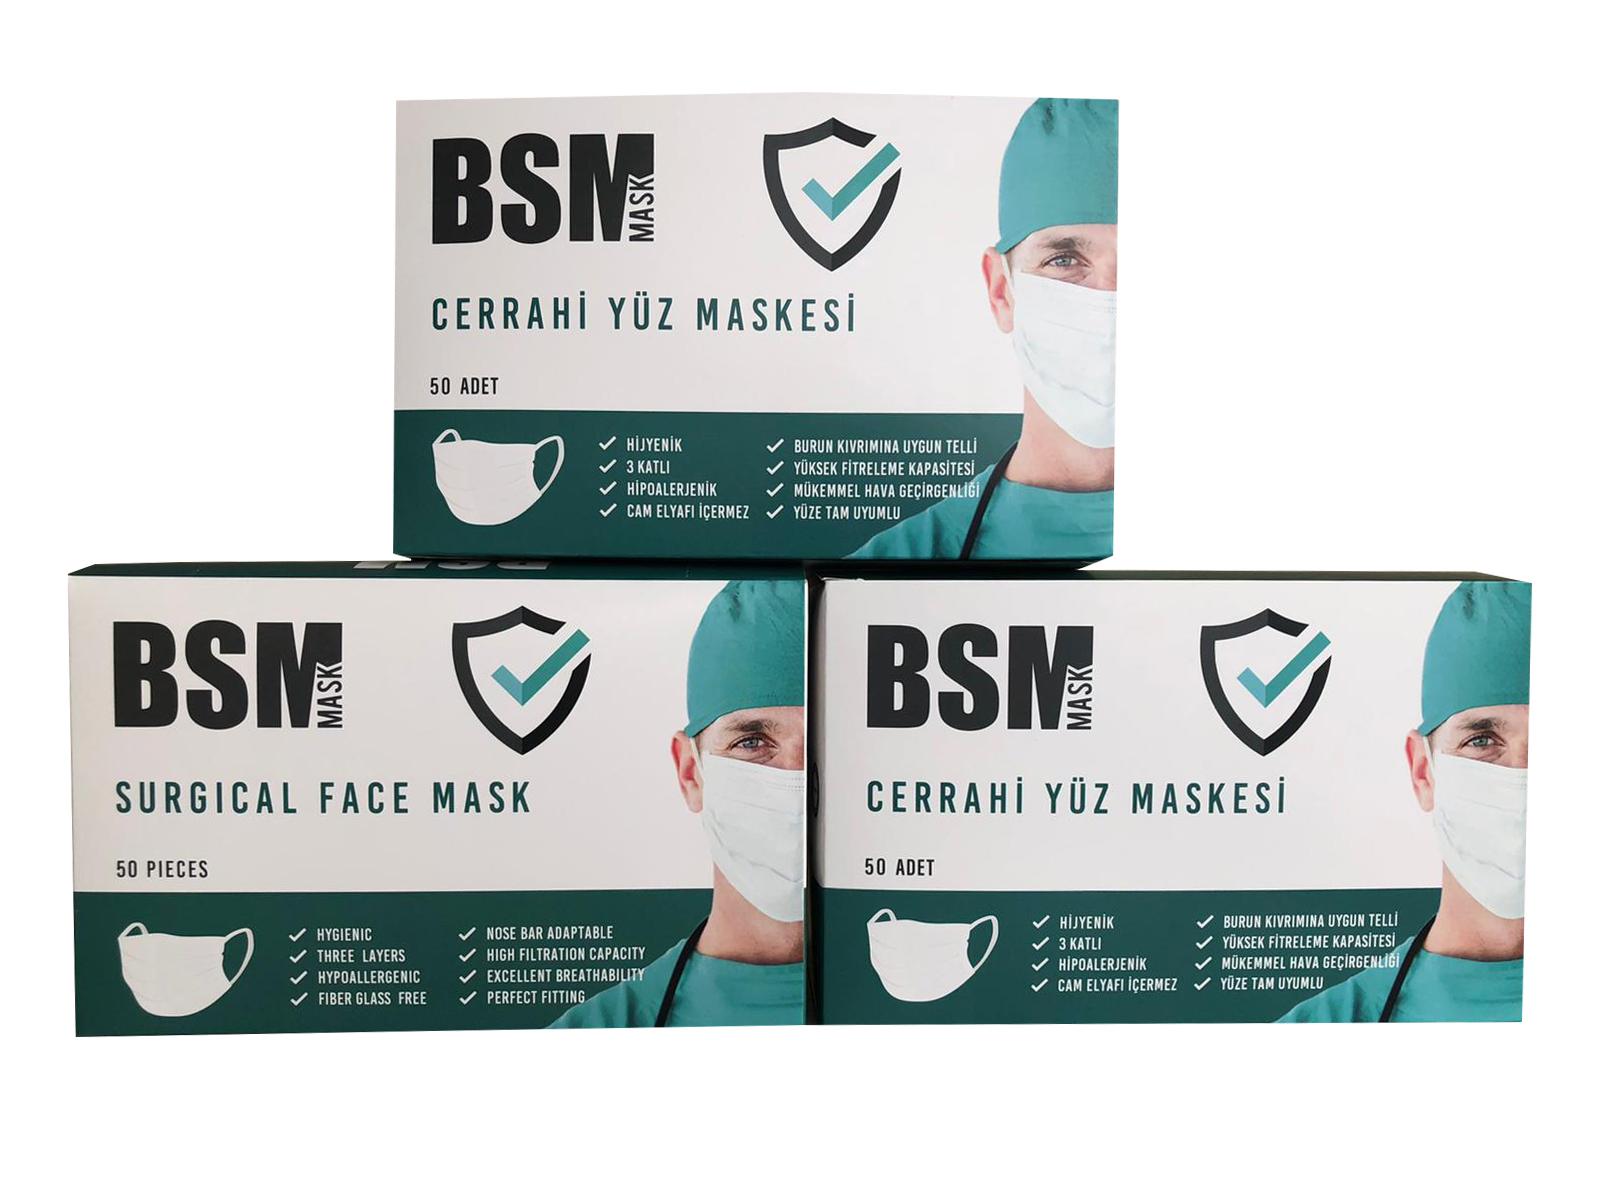 BSM YEŞİL 3 Katlı Yassı Lastikli MELTBLOWN Cerrahi Maske Toplam 150 Adet